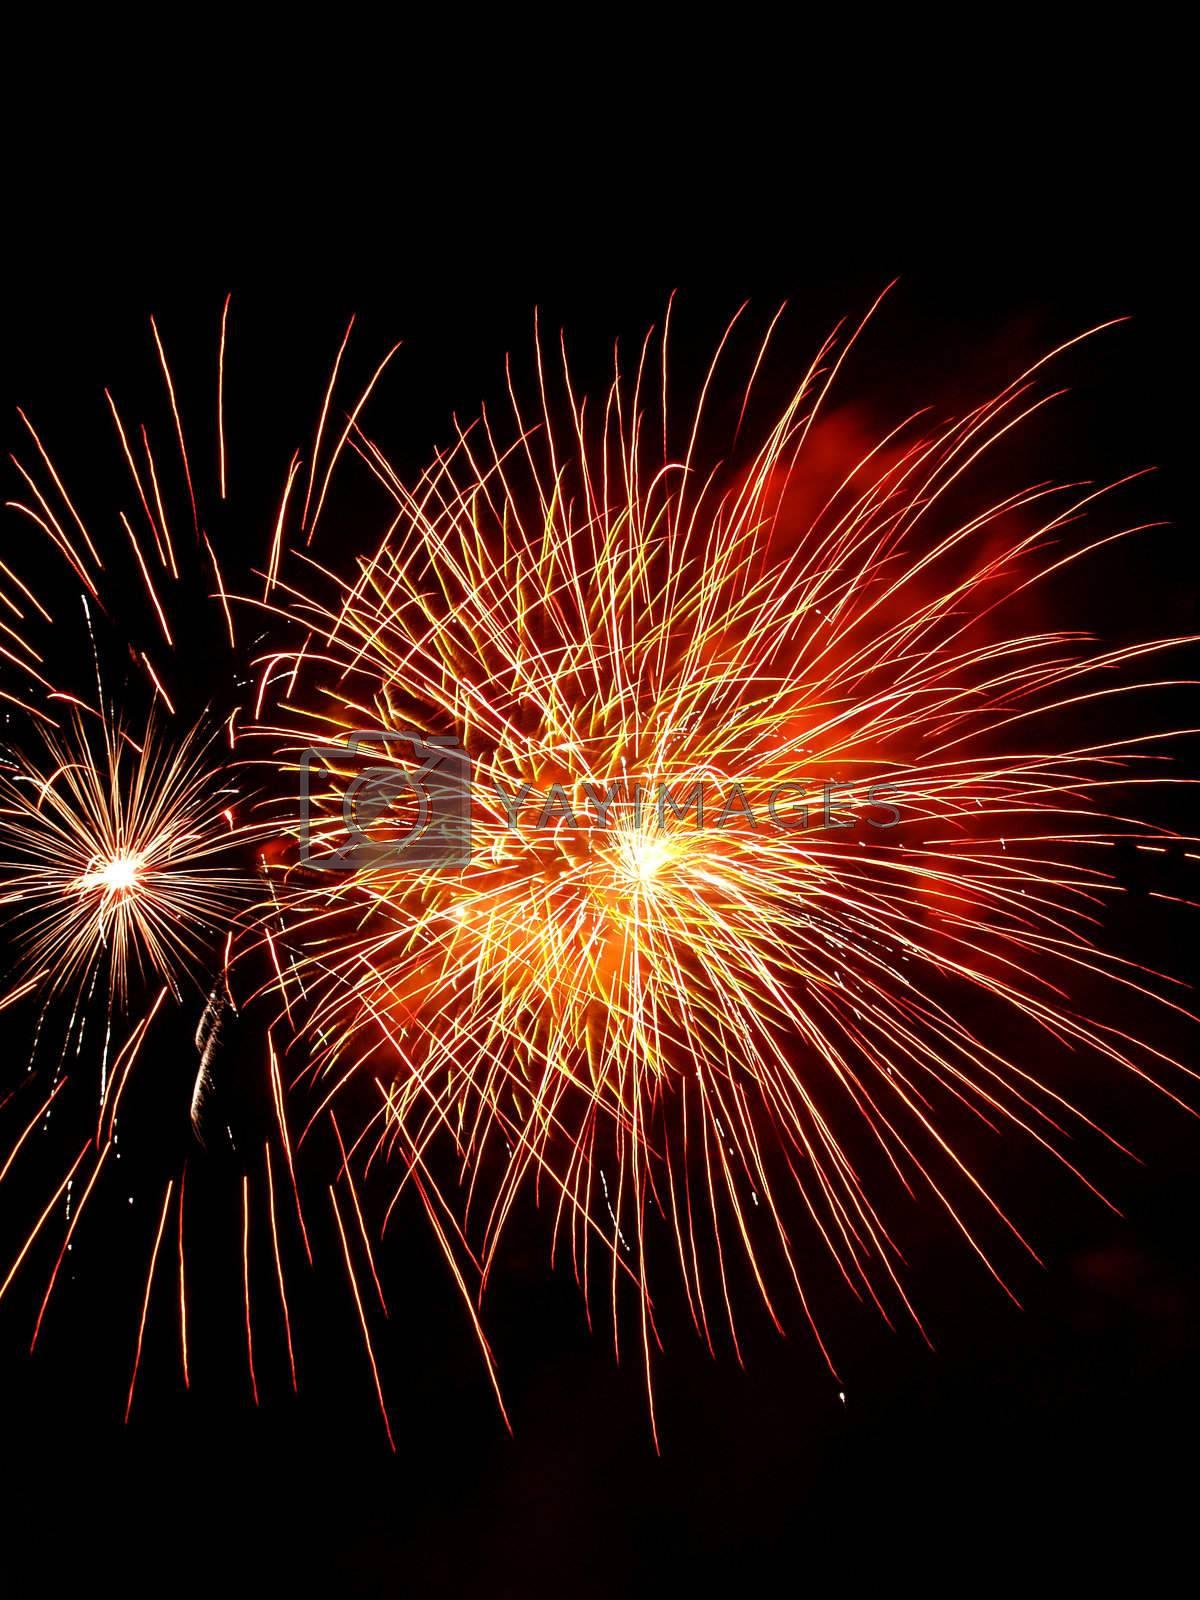 Long Exposure of Fireworks Against a Black Sky